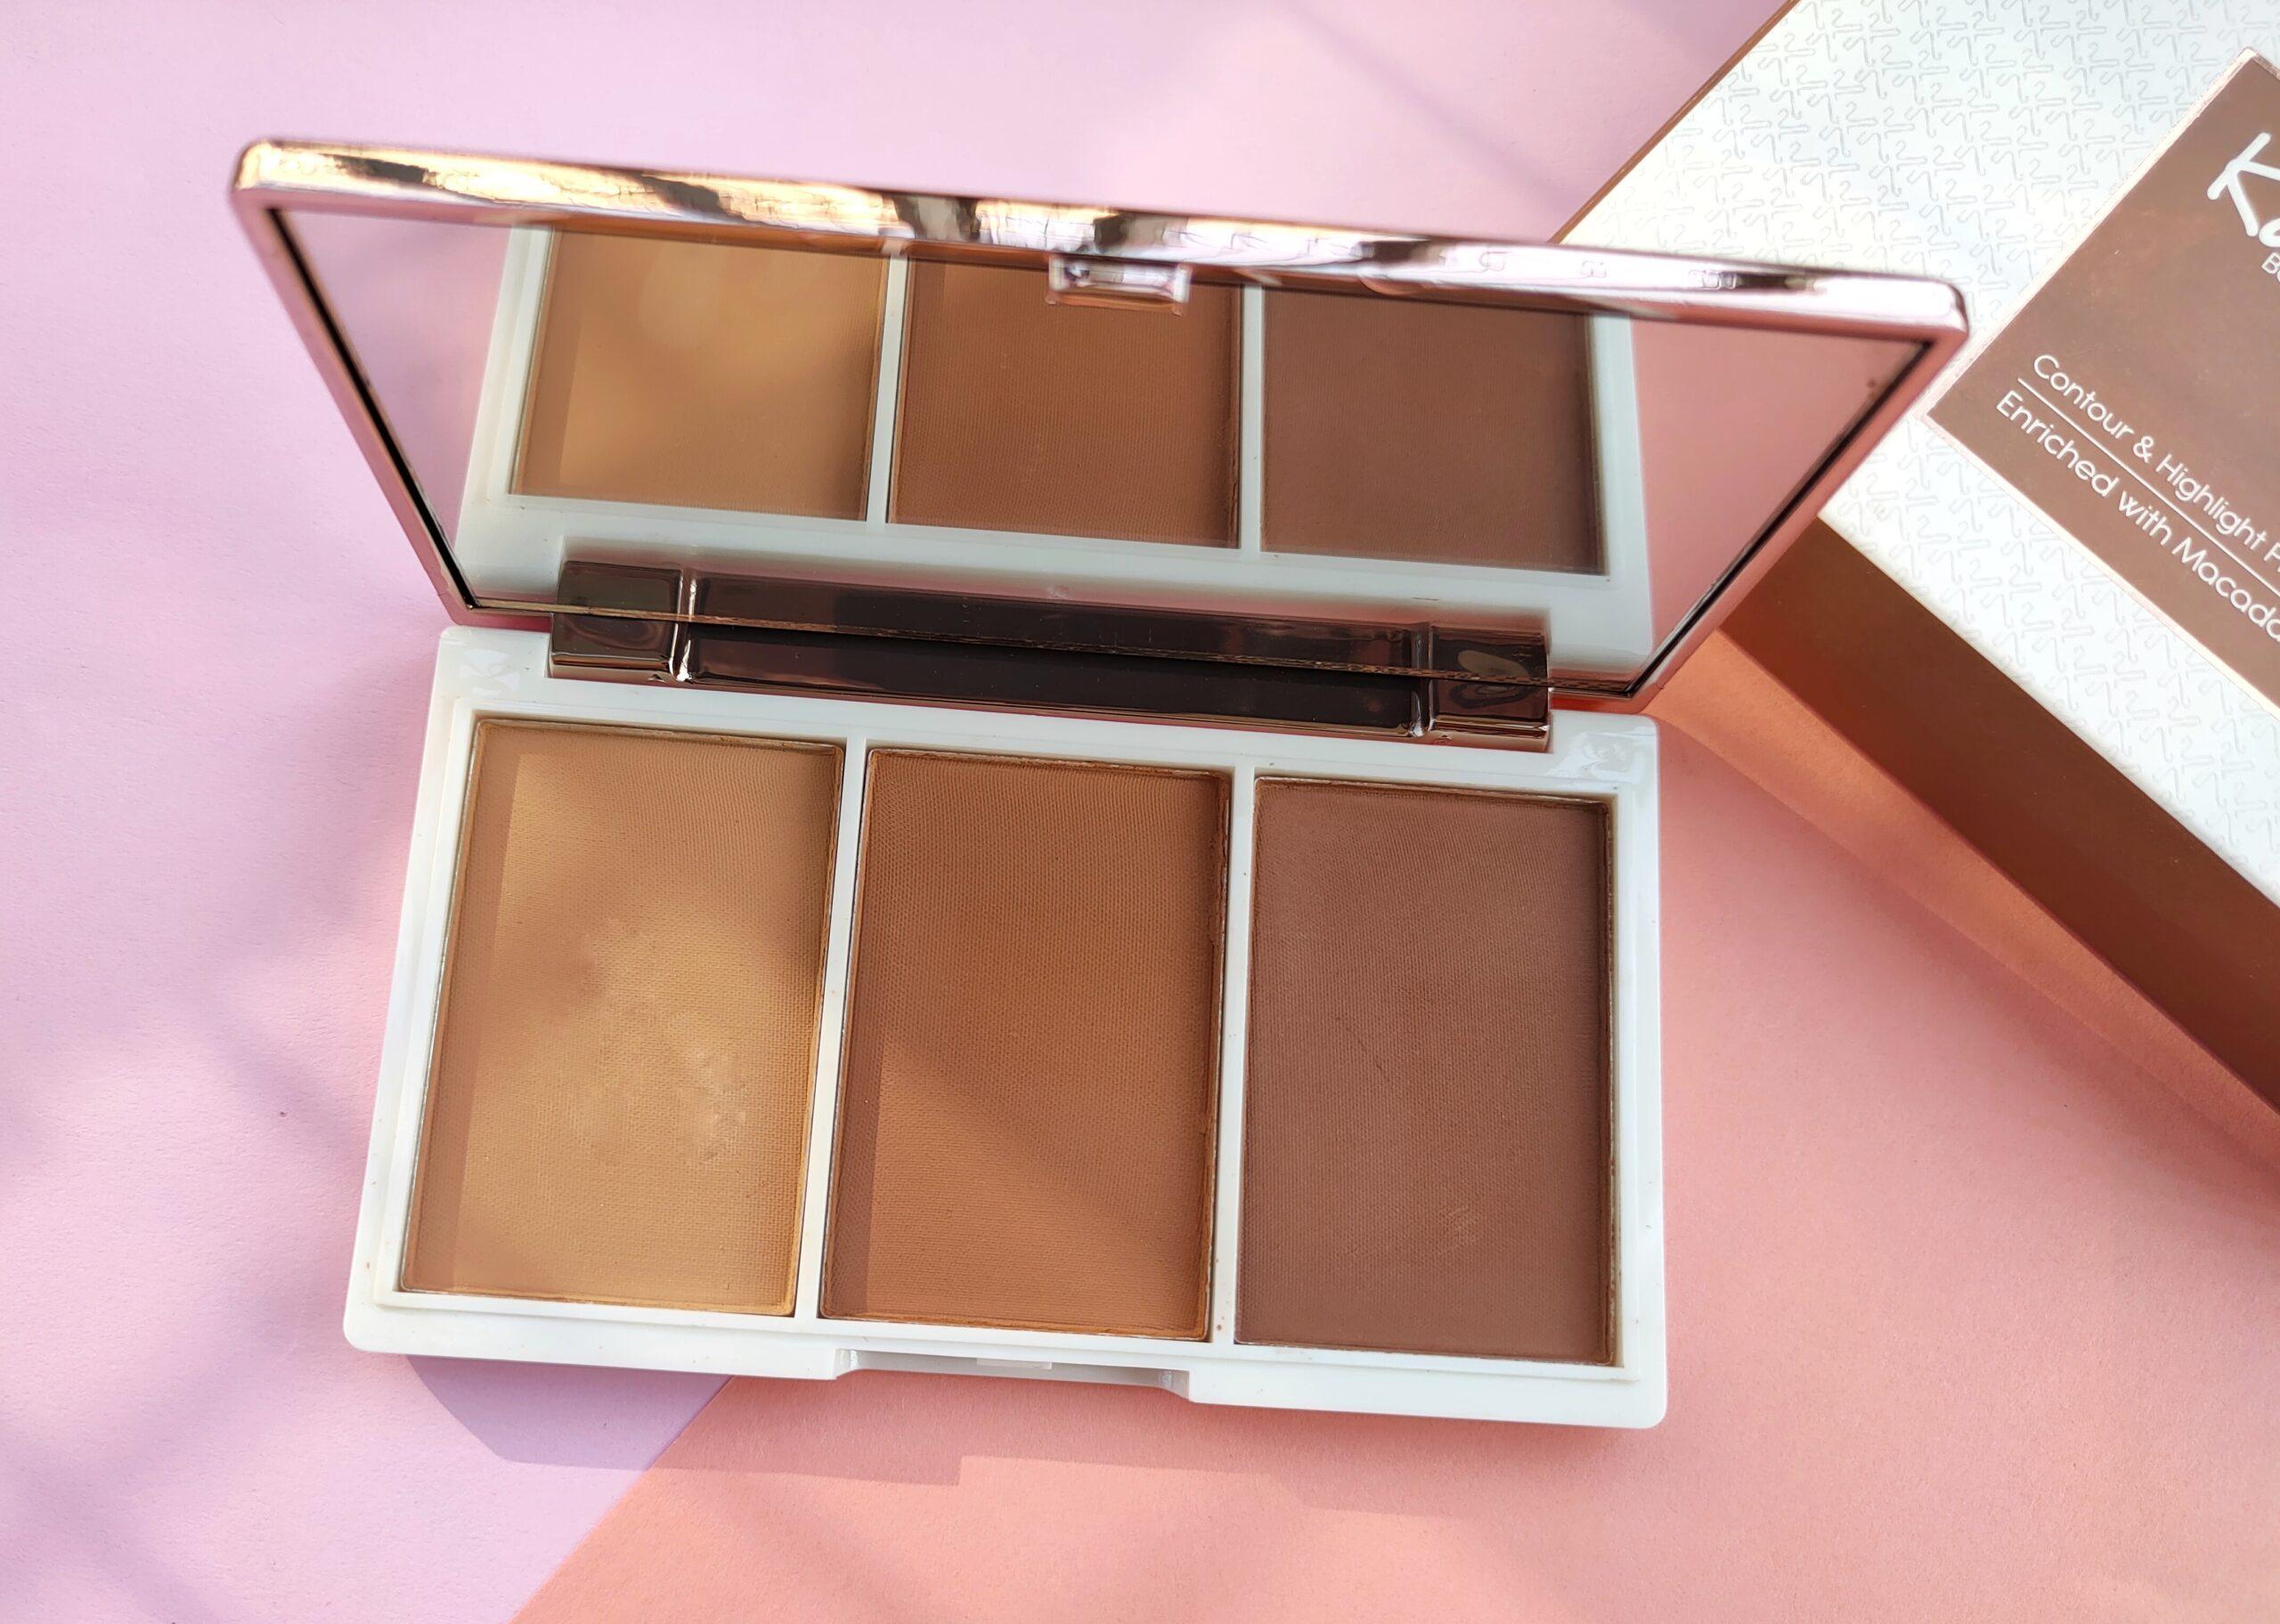 kay-beauty-contour-highlight-pro-palette-review